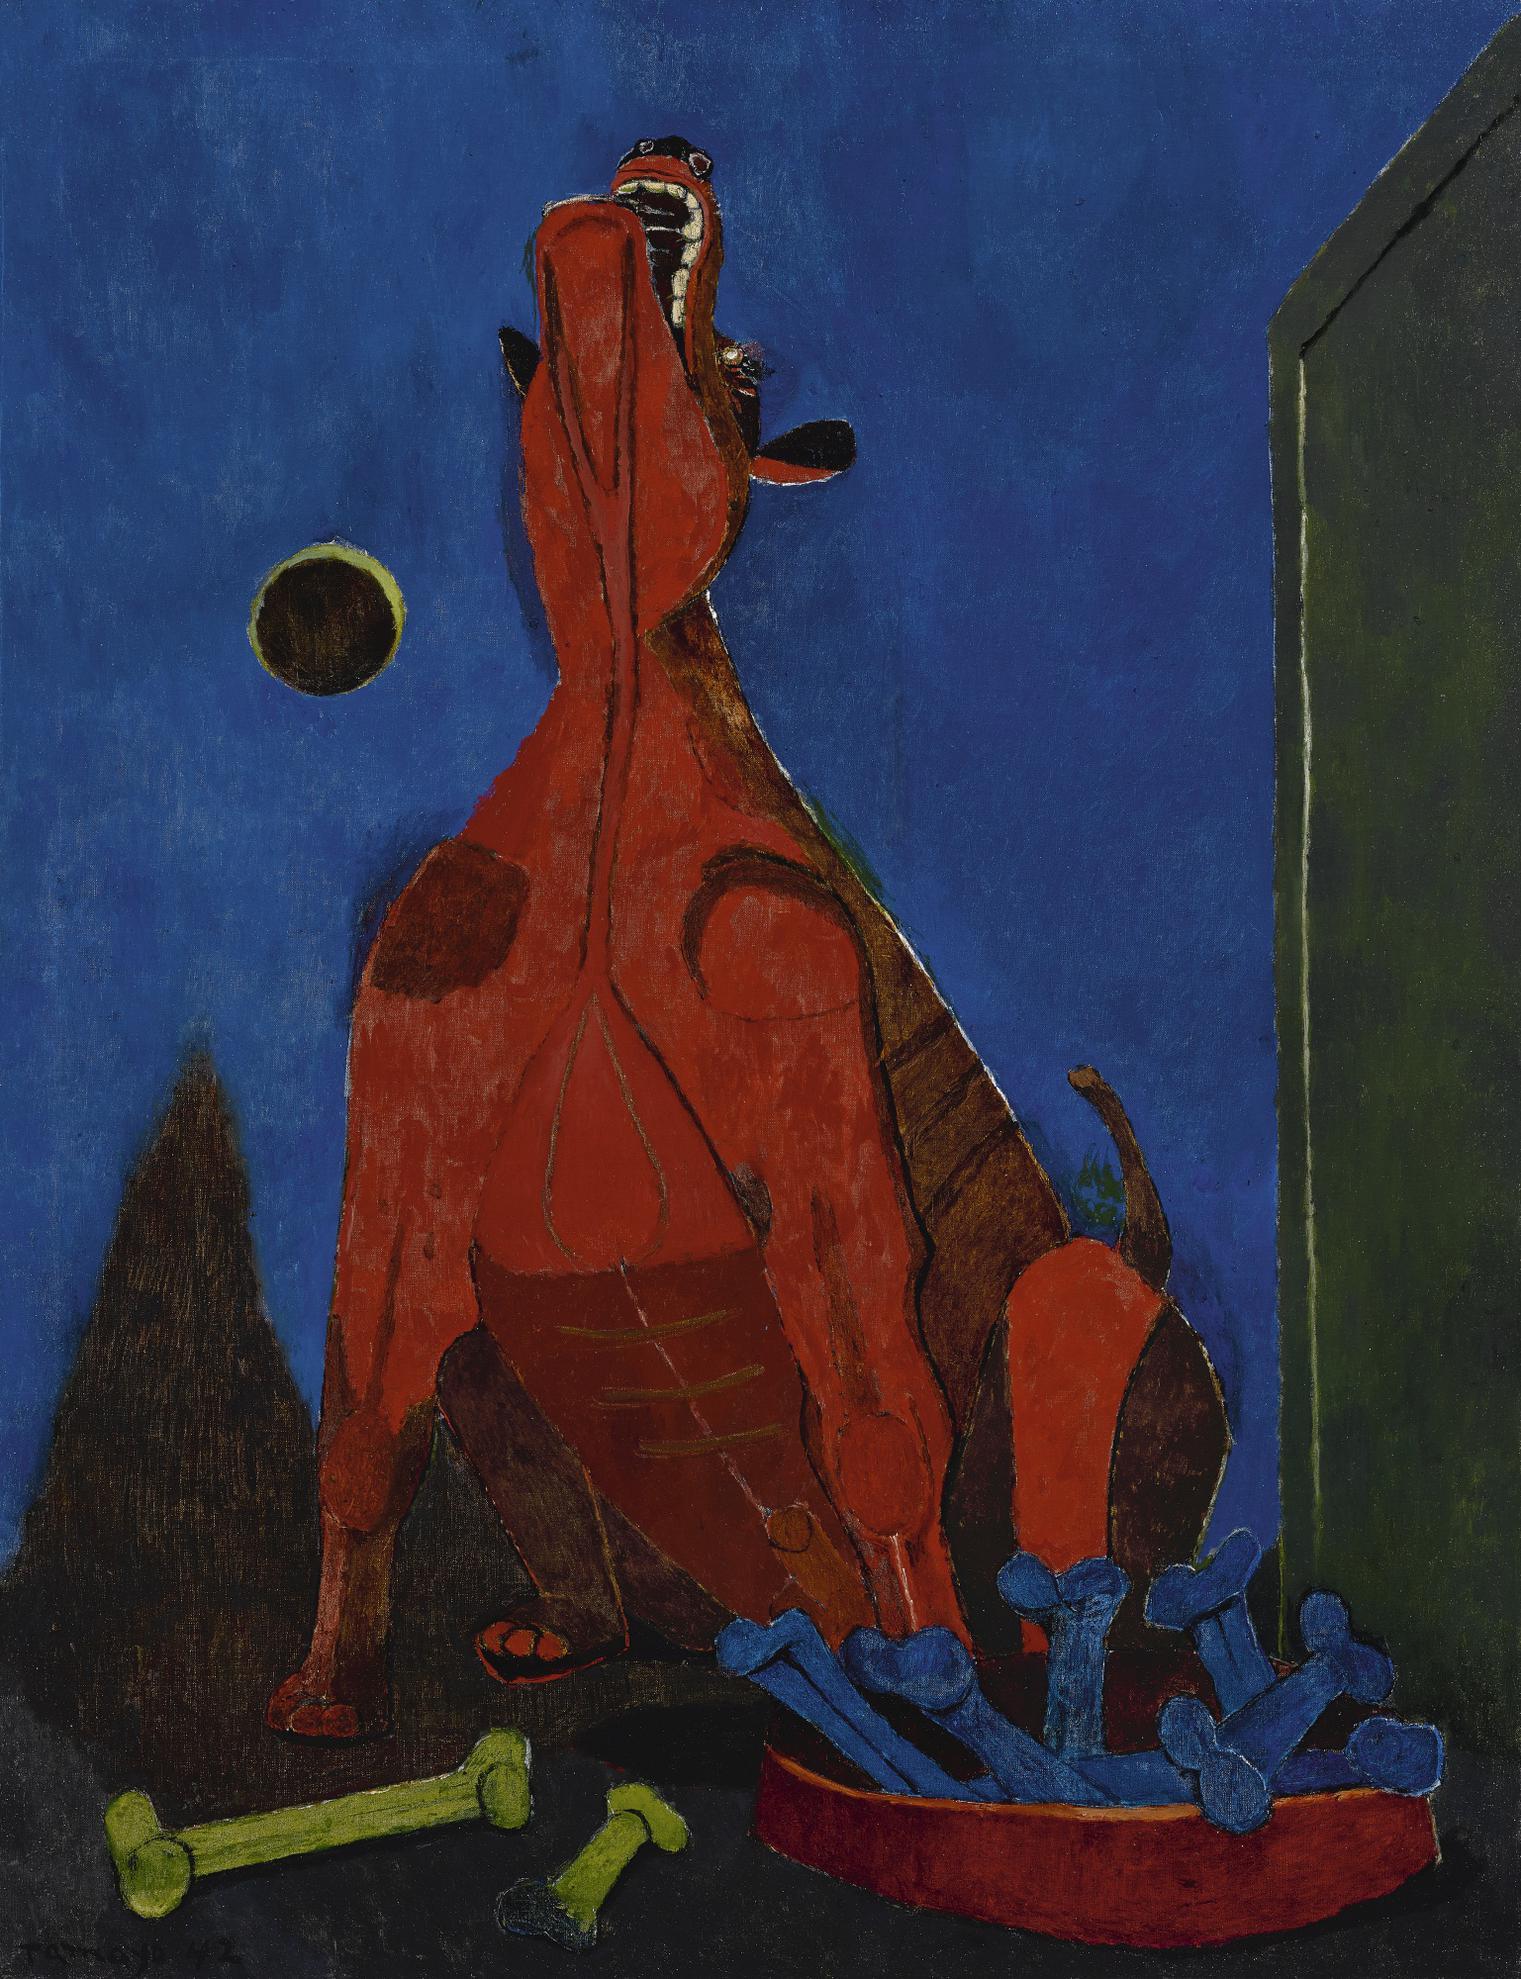 Rufino Tamayo-Perro Aullando A La Luna (Dog Howling At The Moon)-1942